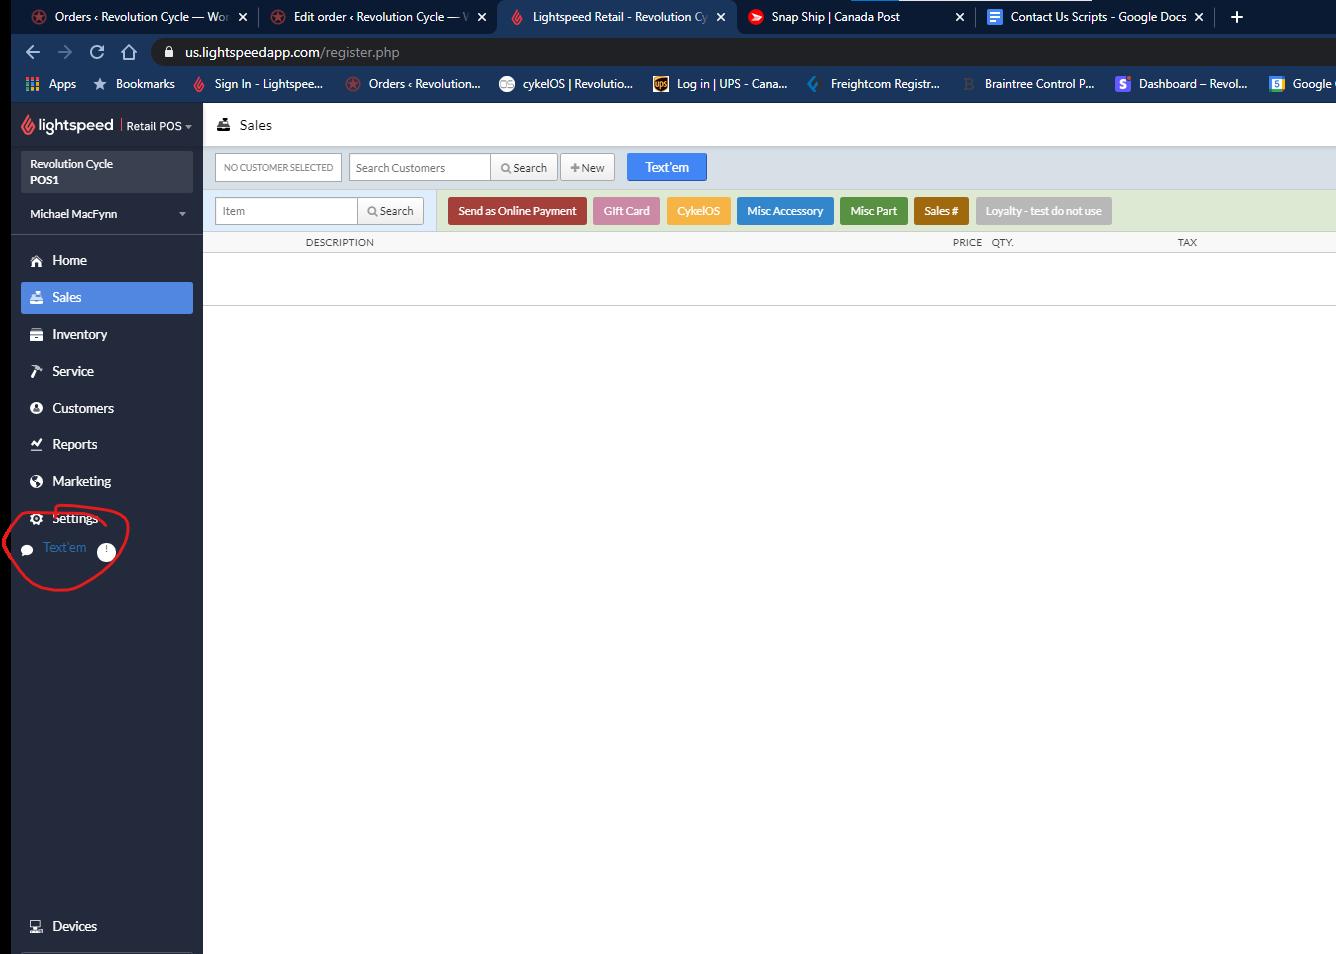 Screenshot 2021-03-22 104357.png